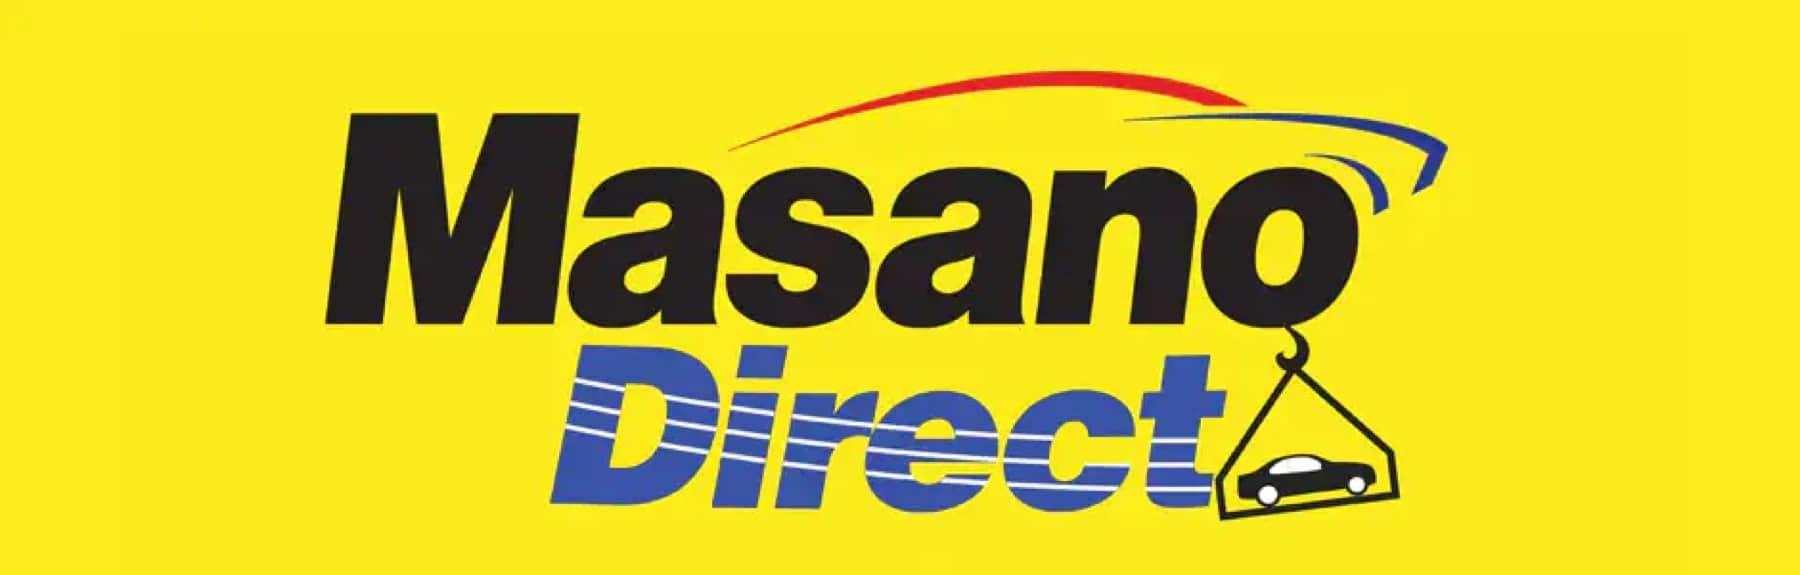 Masano Direct Slider Banner 1